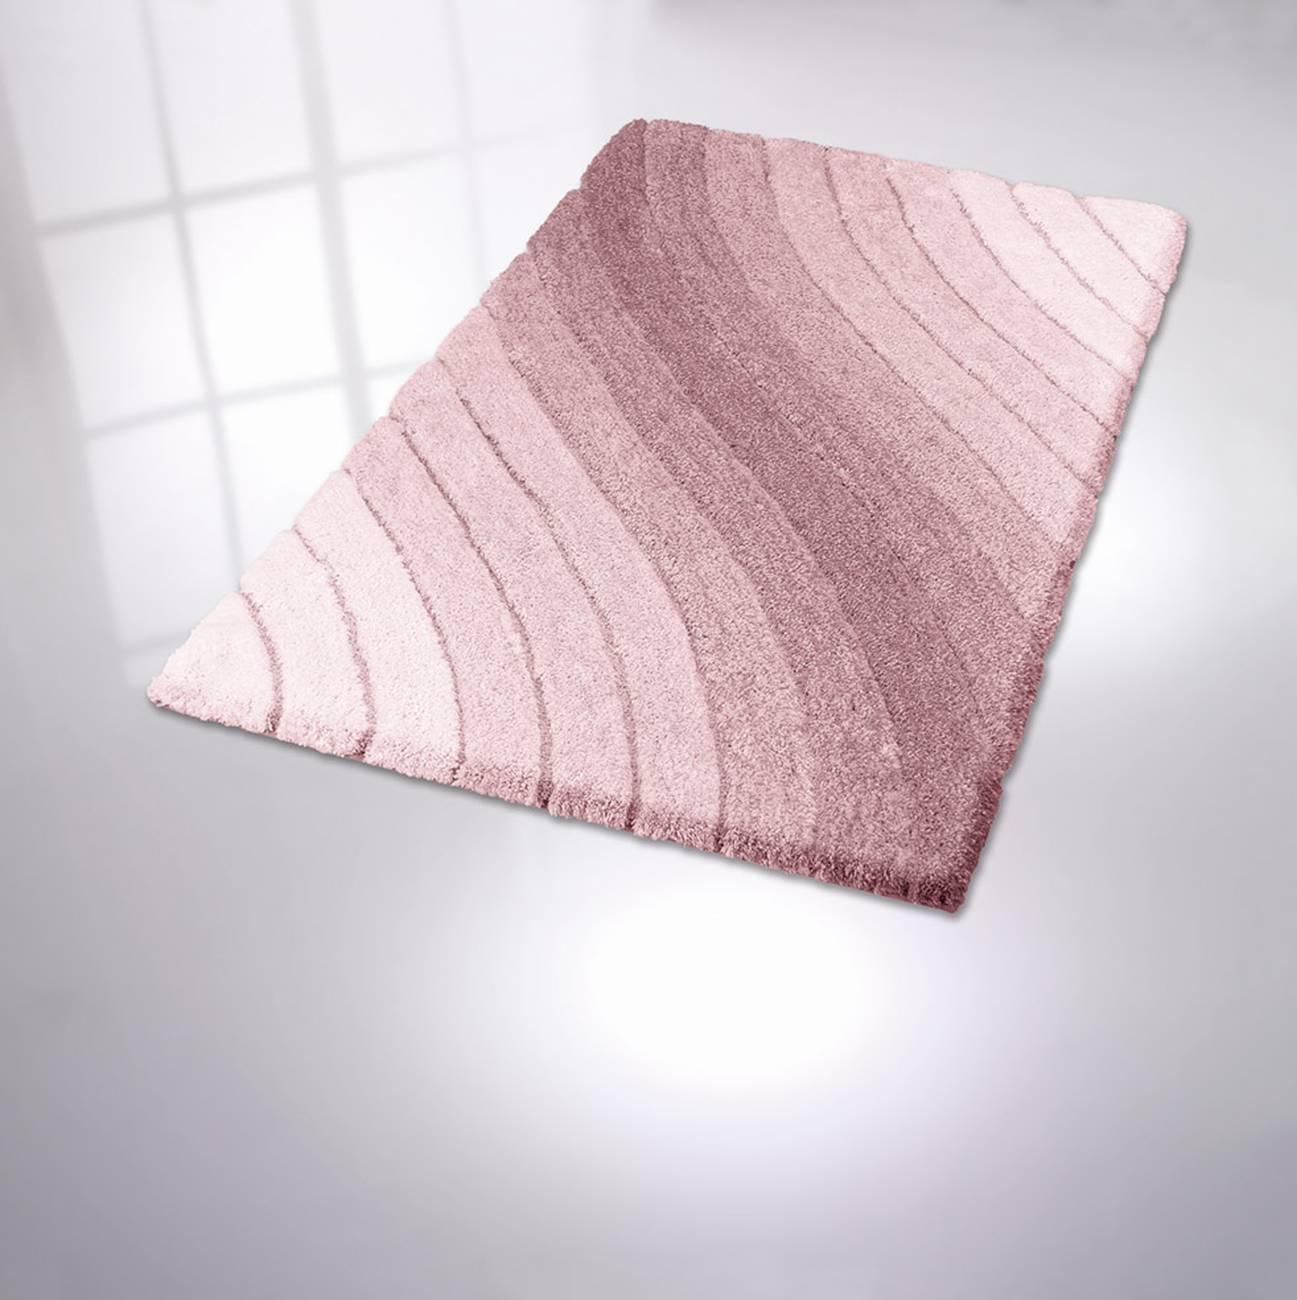 Badteppich Tender 100 % Polyester Opal 60x100 cm